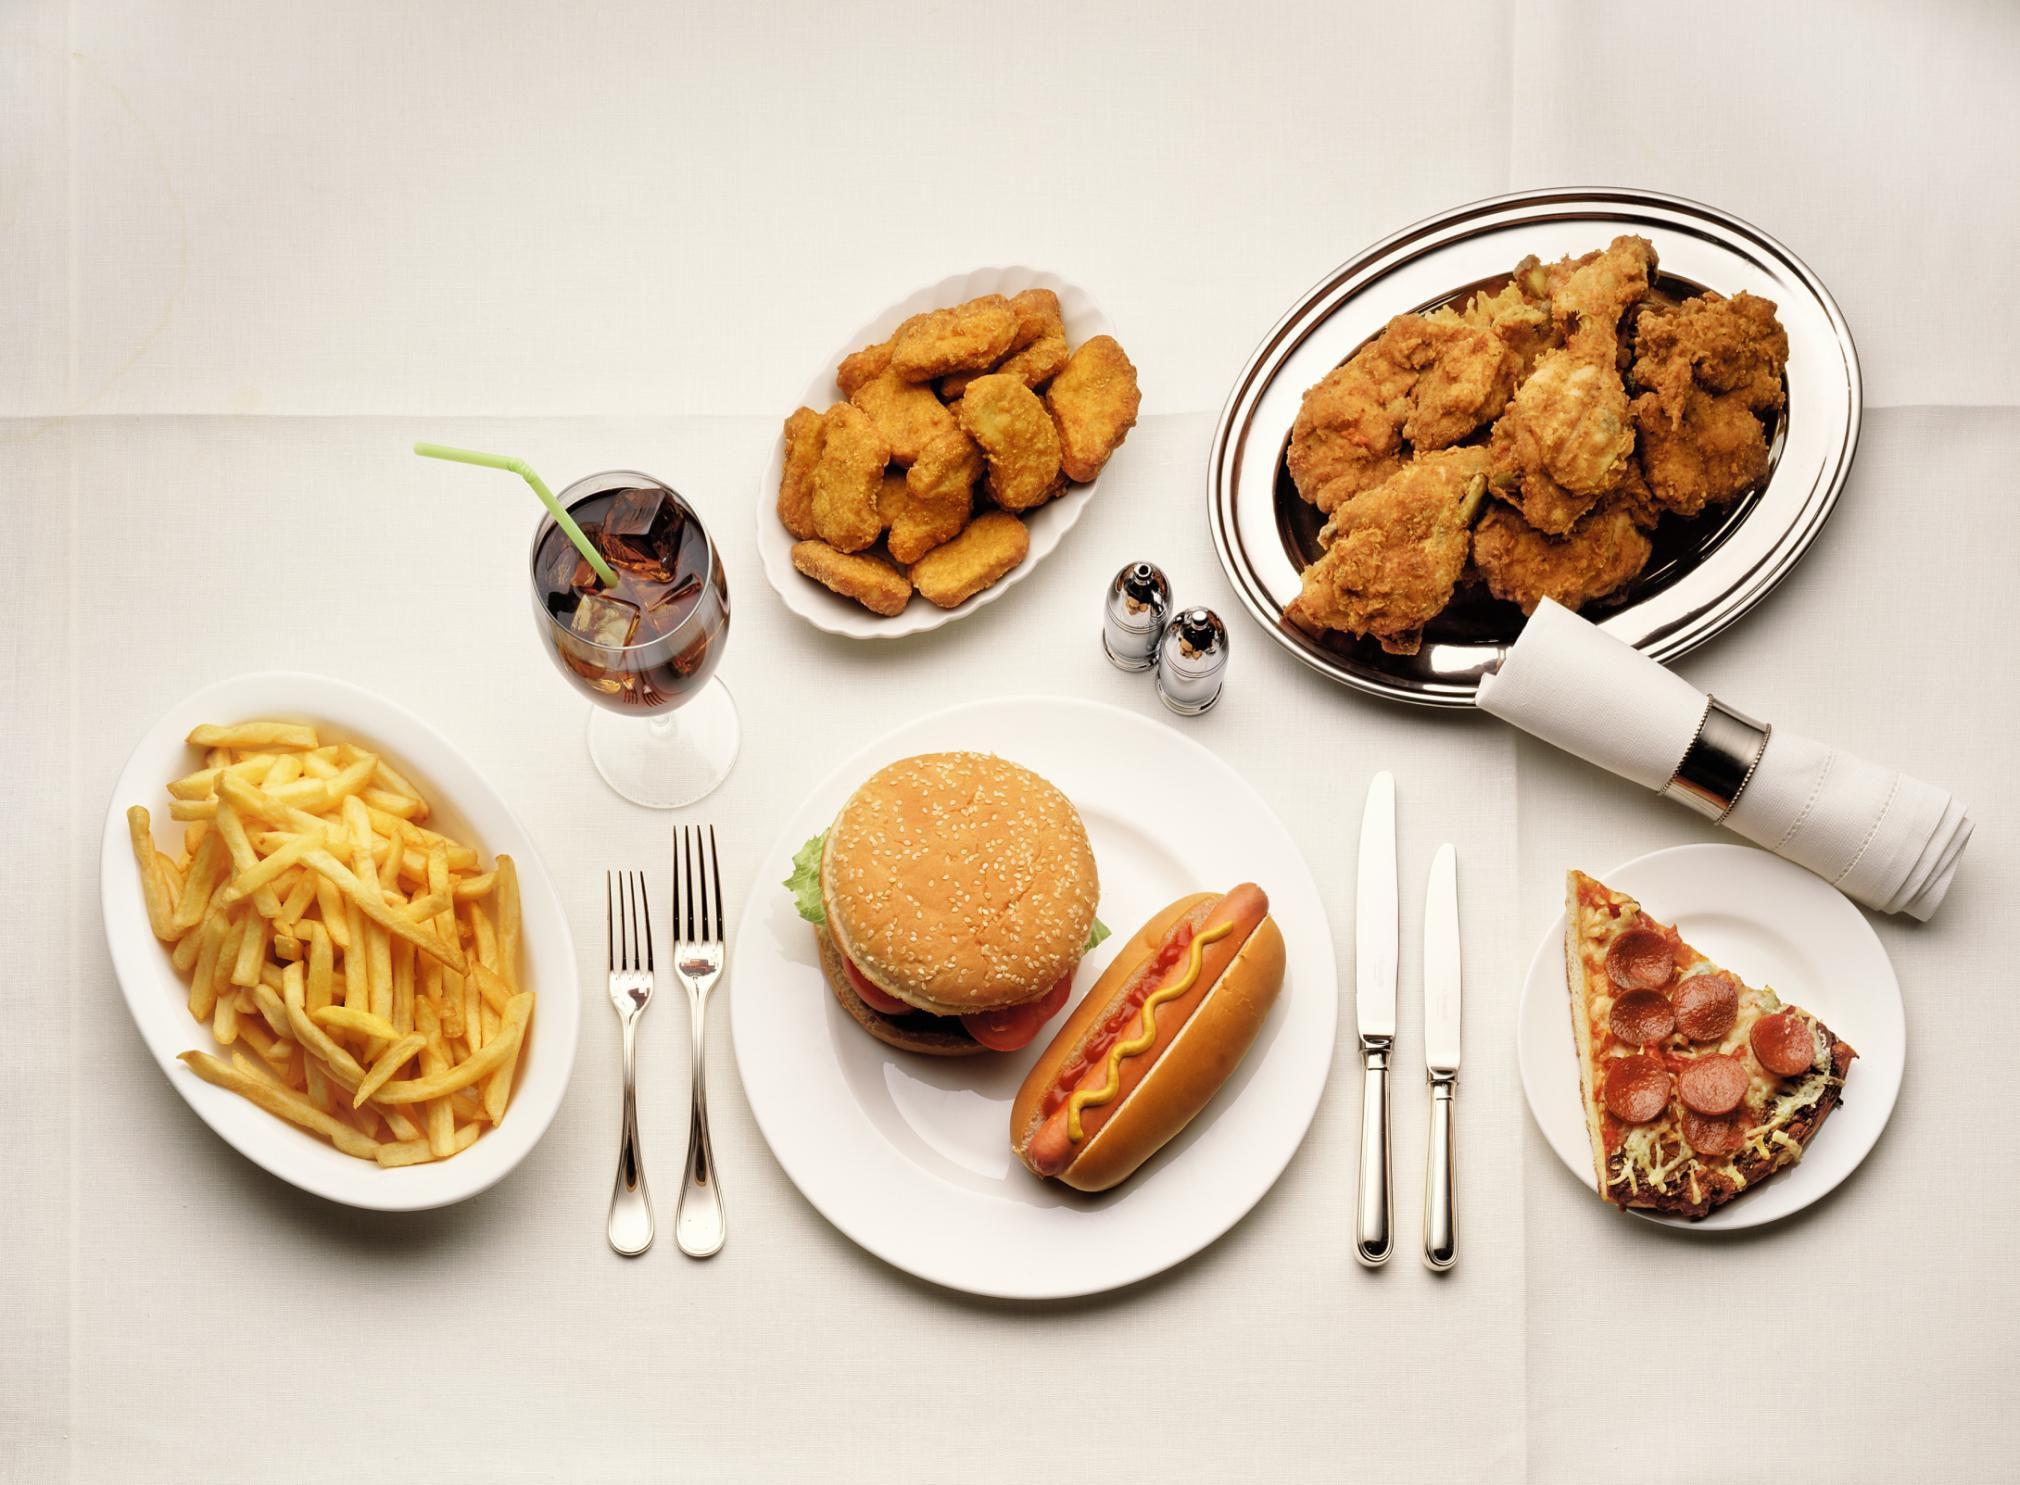 Cholesterol Food To Avoid